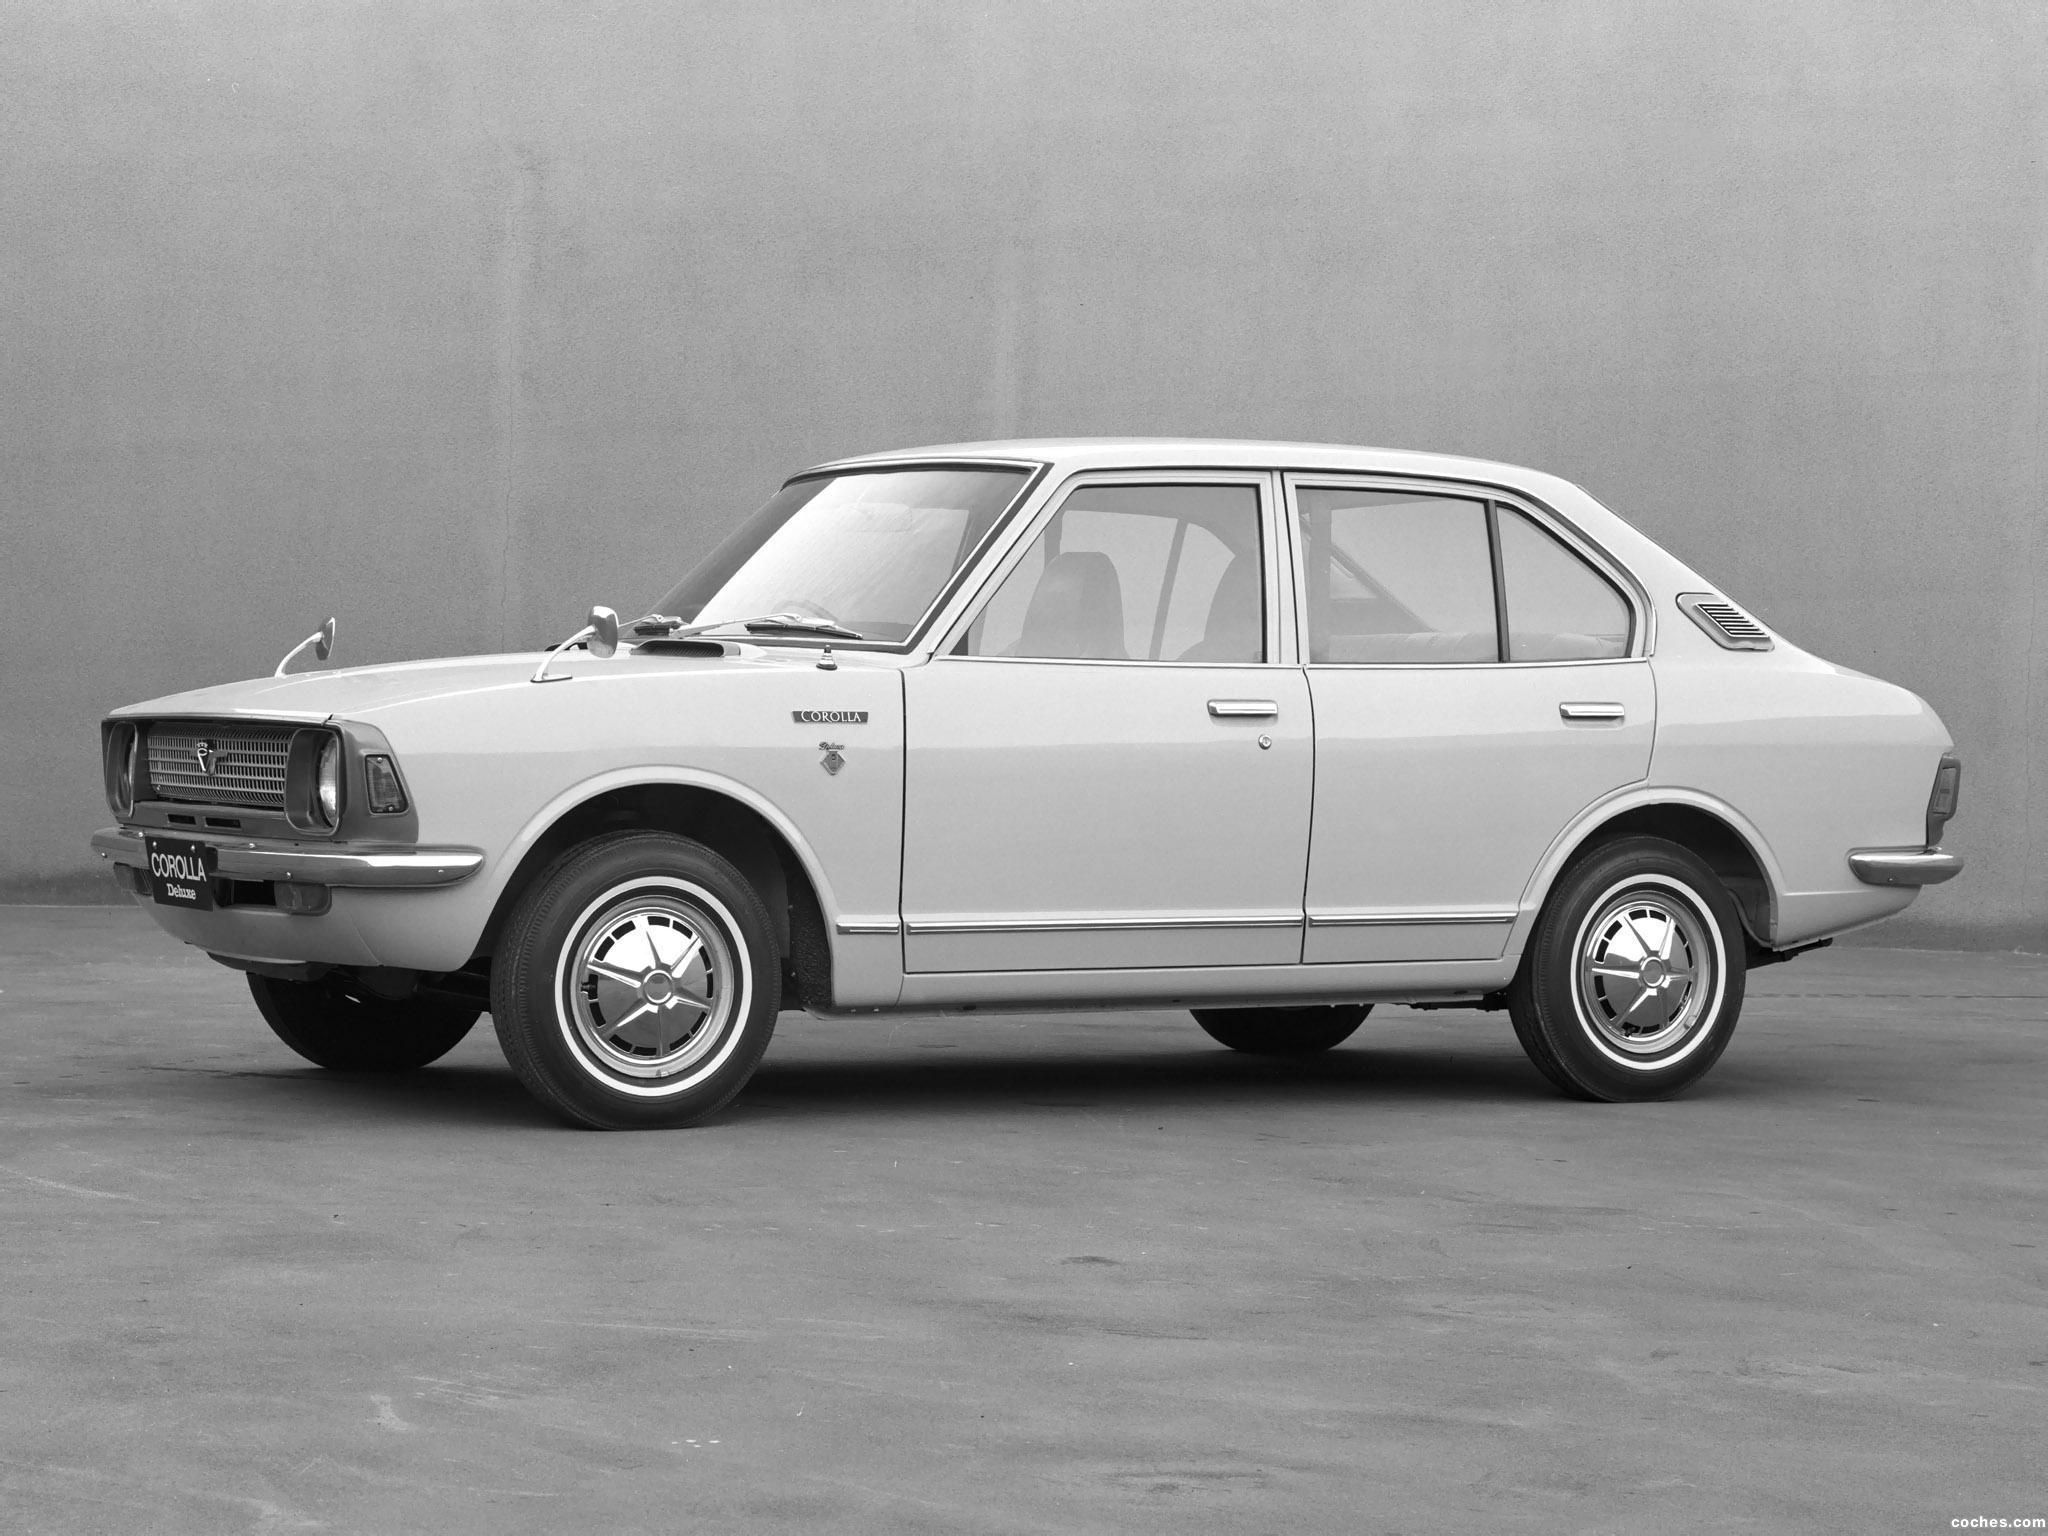 Fotos de Toyota Corolla 4 puertas Sedan KE20 Japan 1970